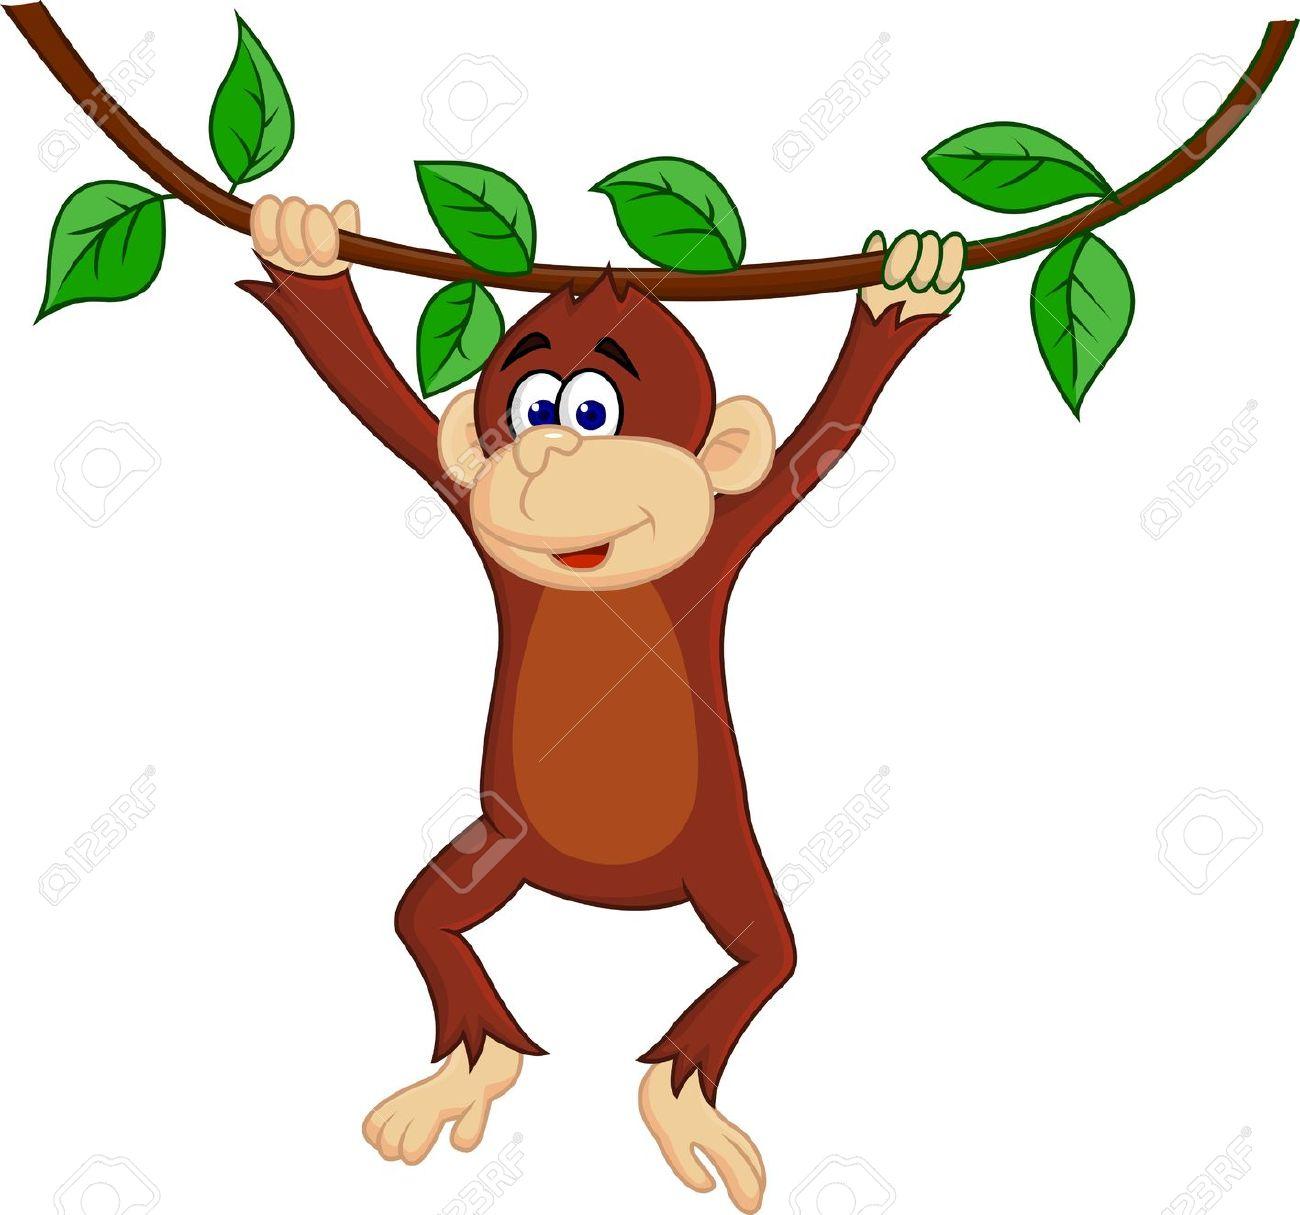 1300x1215 Monkey banana clip art image